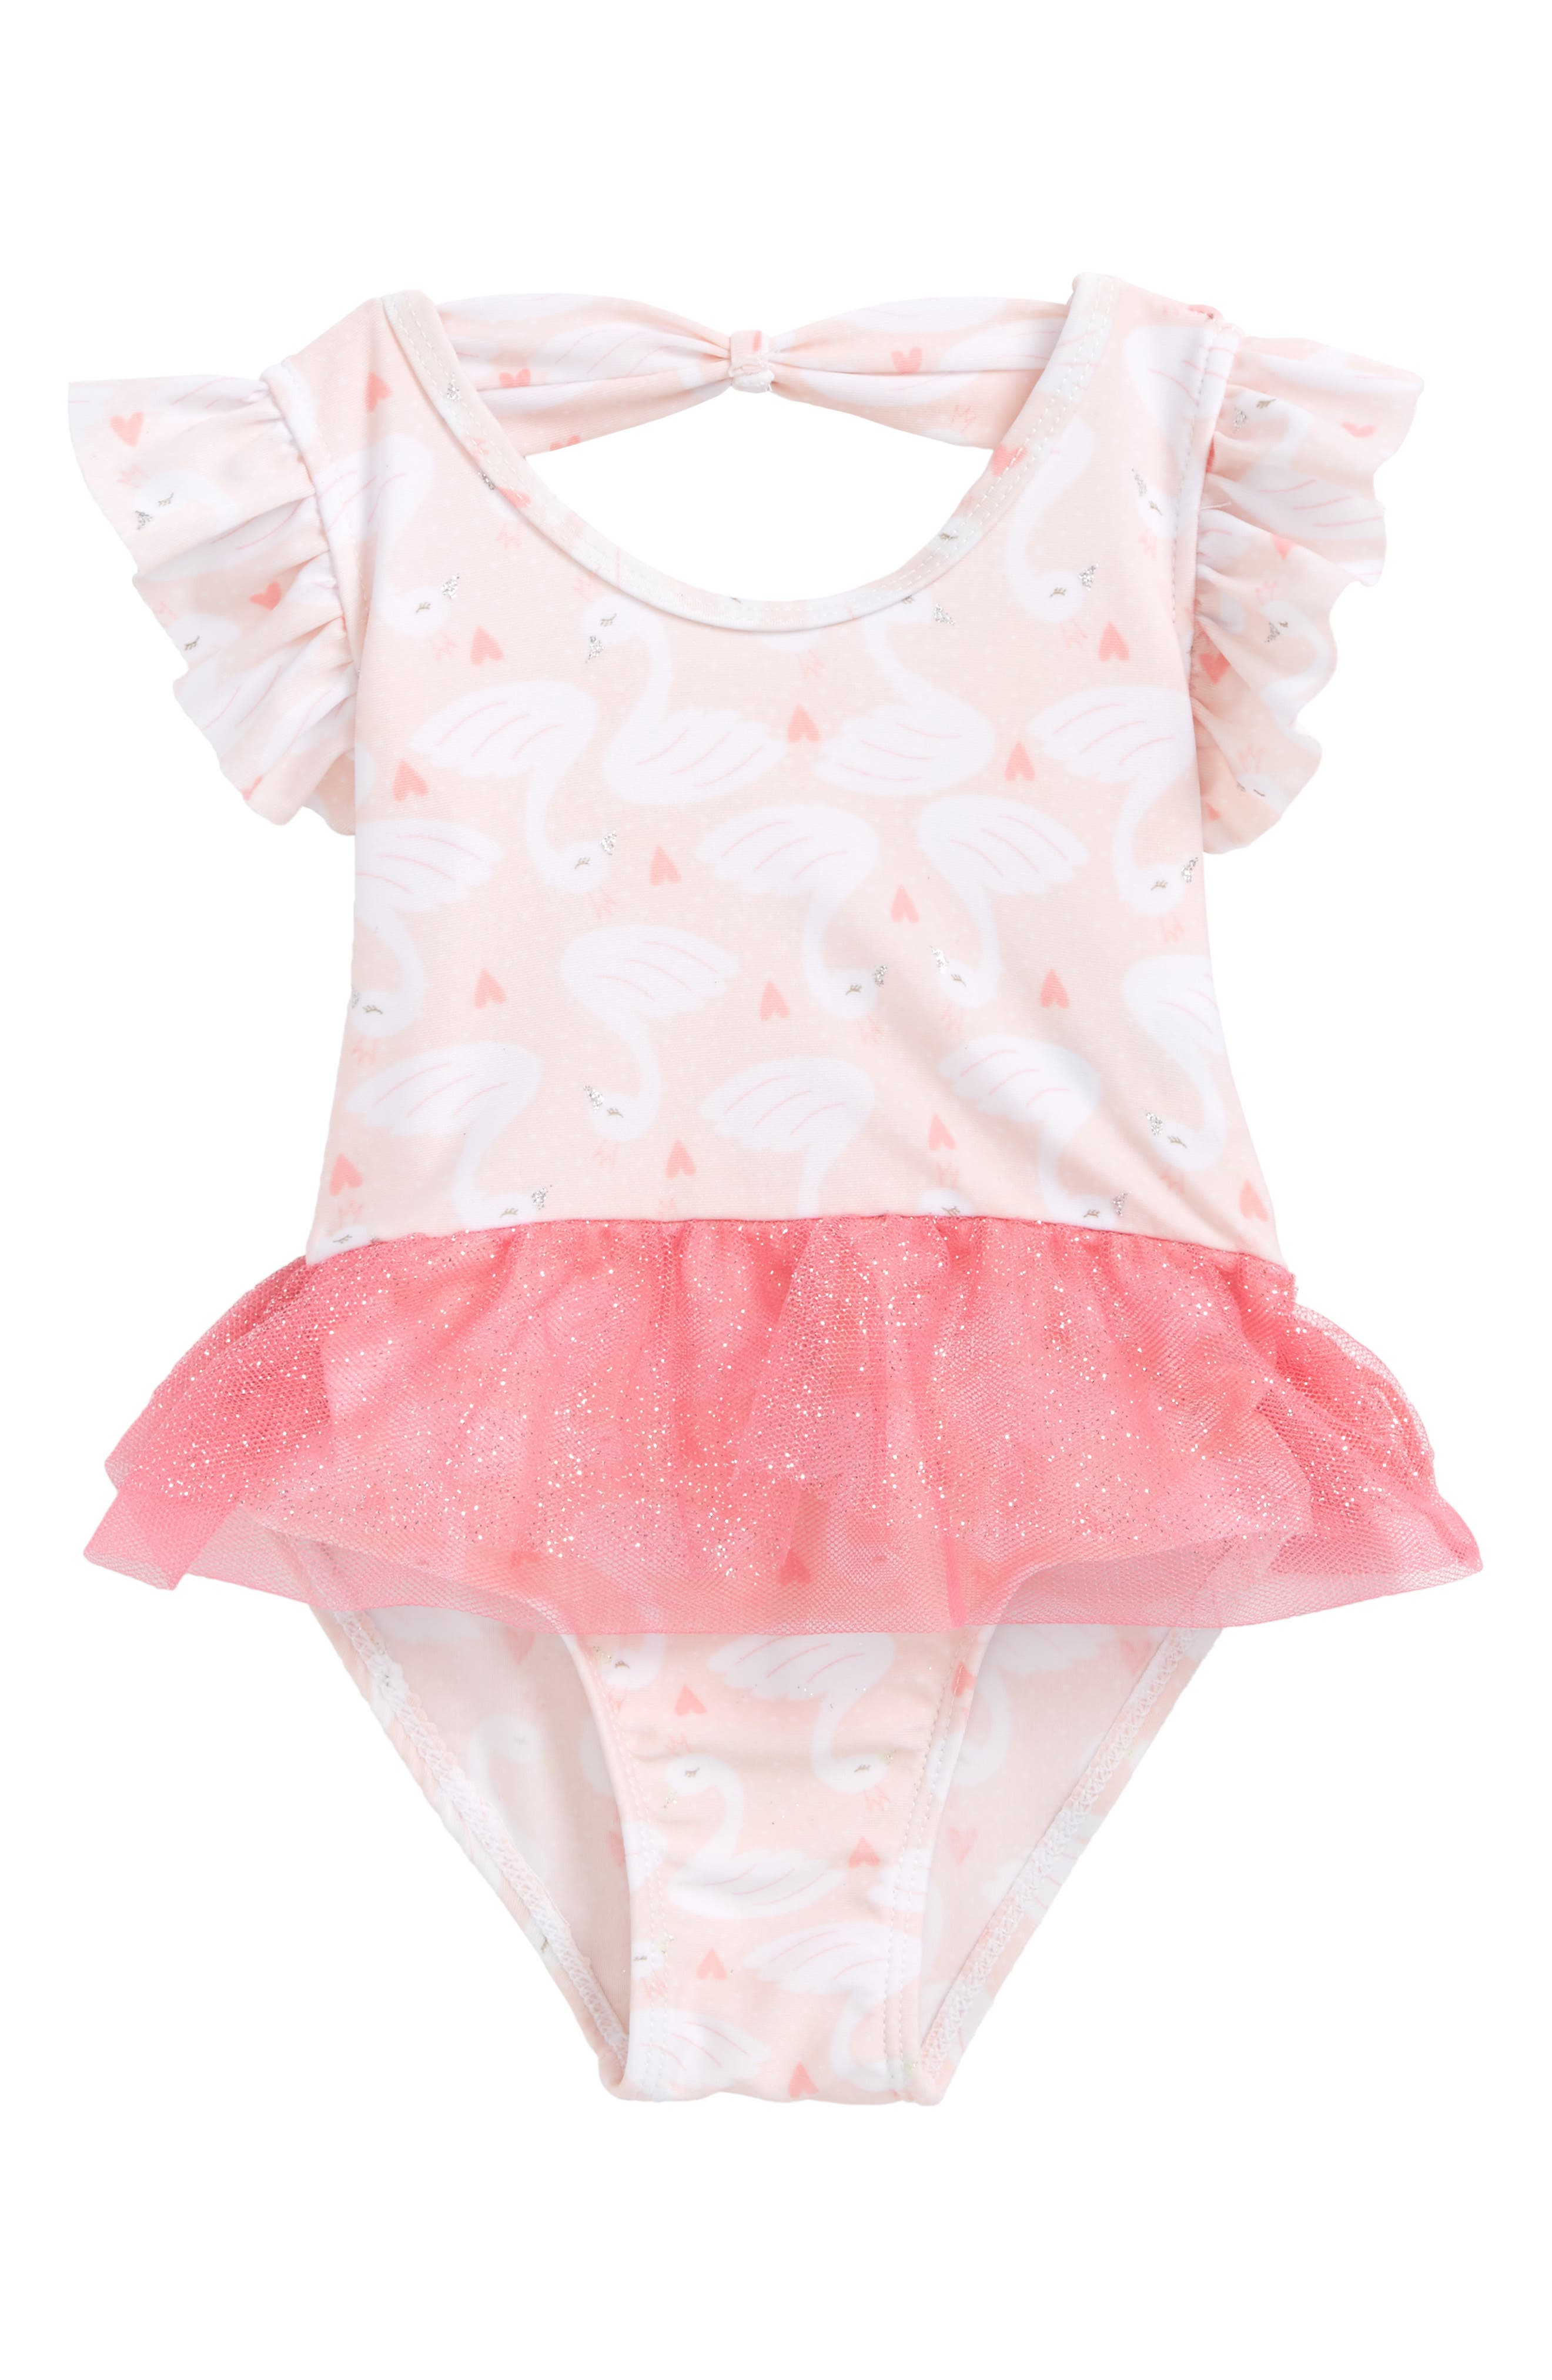 Princess Swan One-Piece Swimsuit,                             Main thumbnail 1, color,                             650